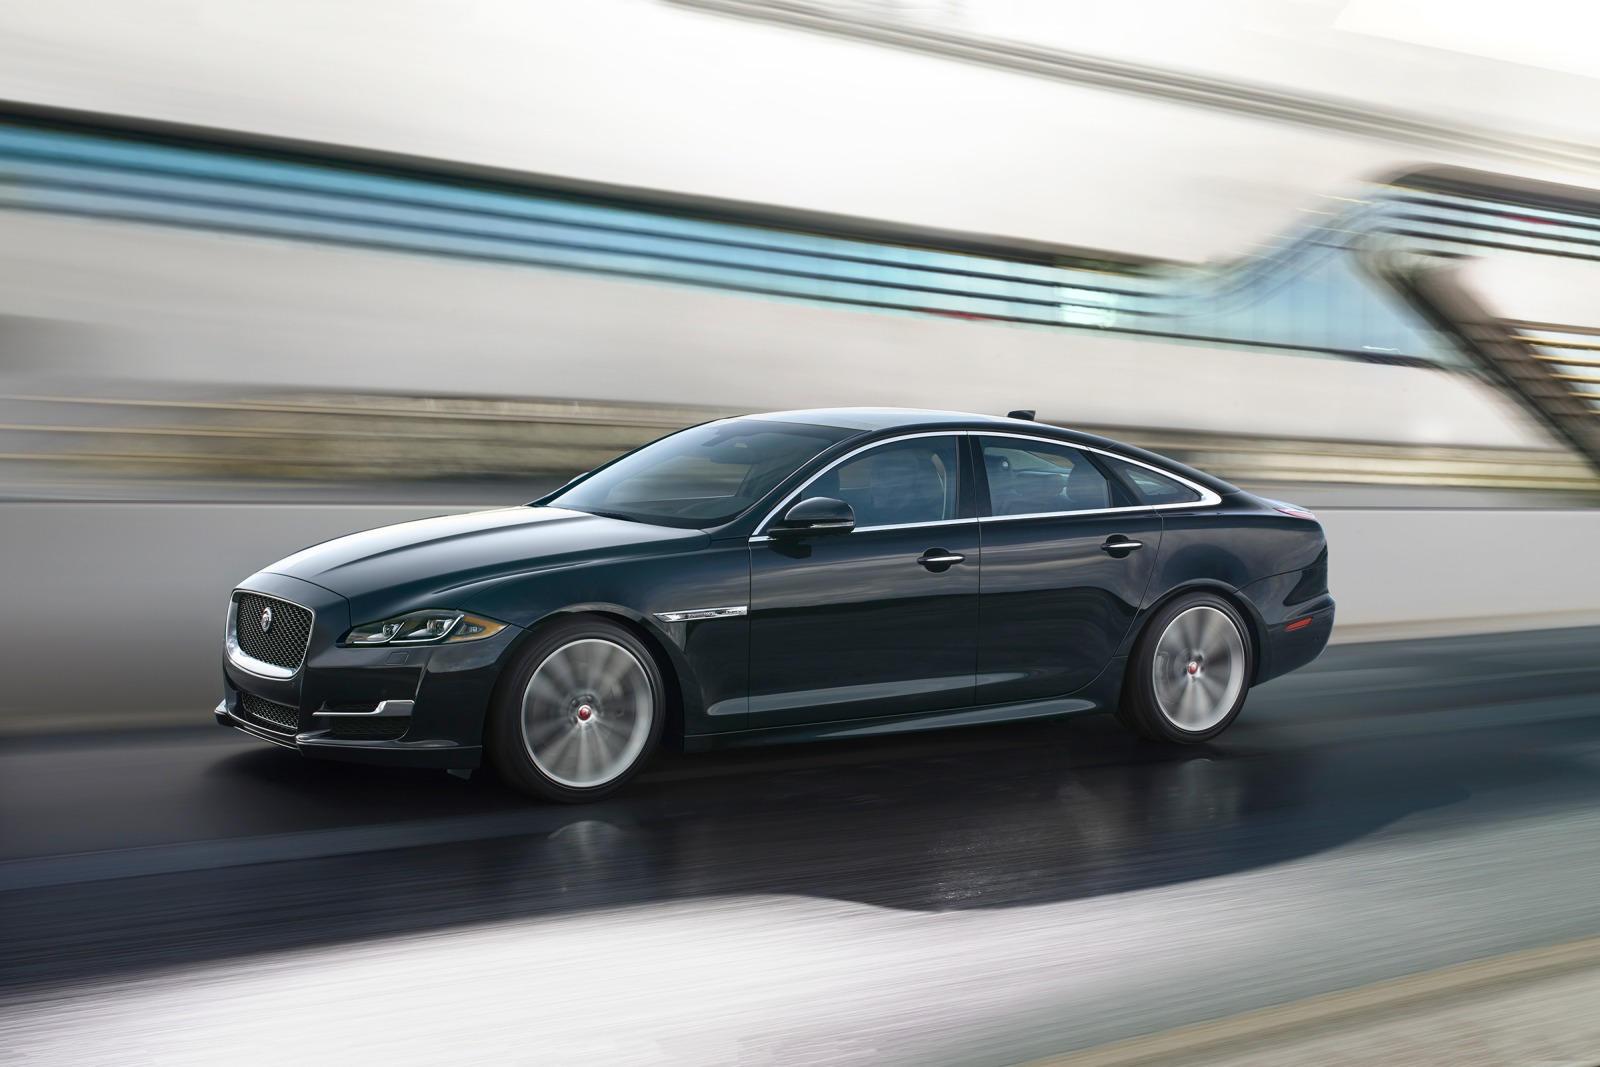 xj xjl top price jaguar cars speed